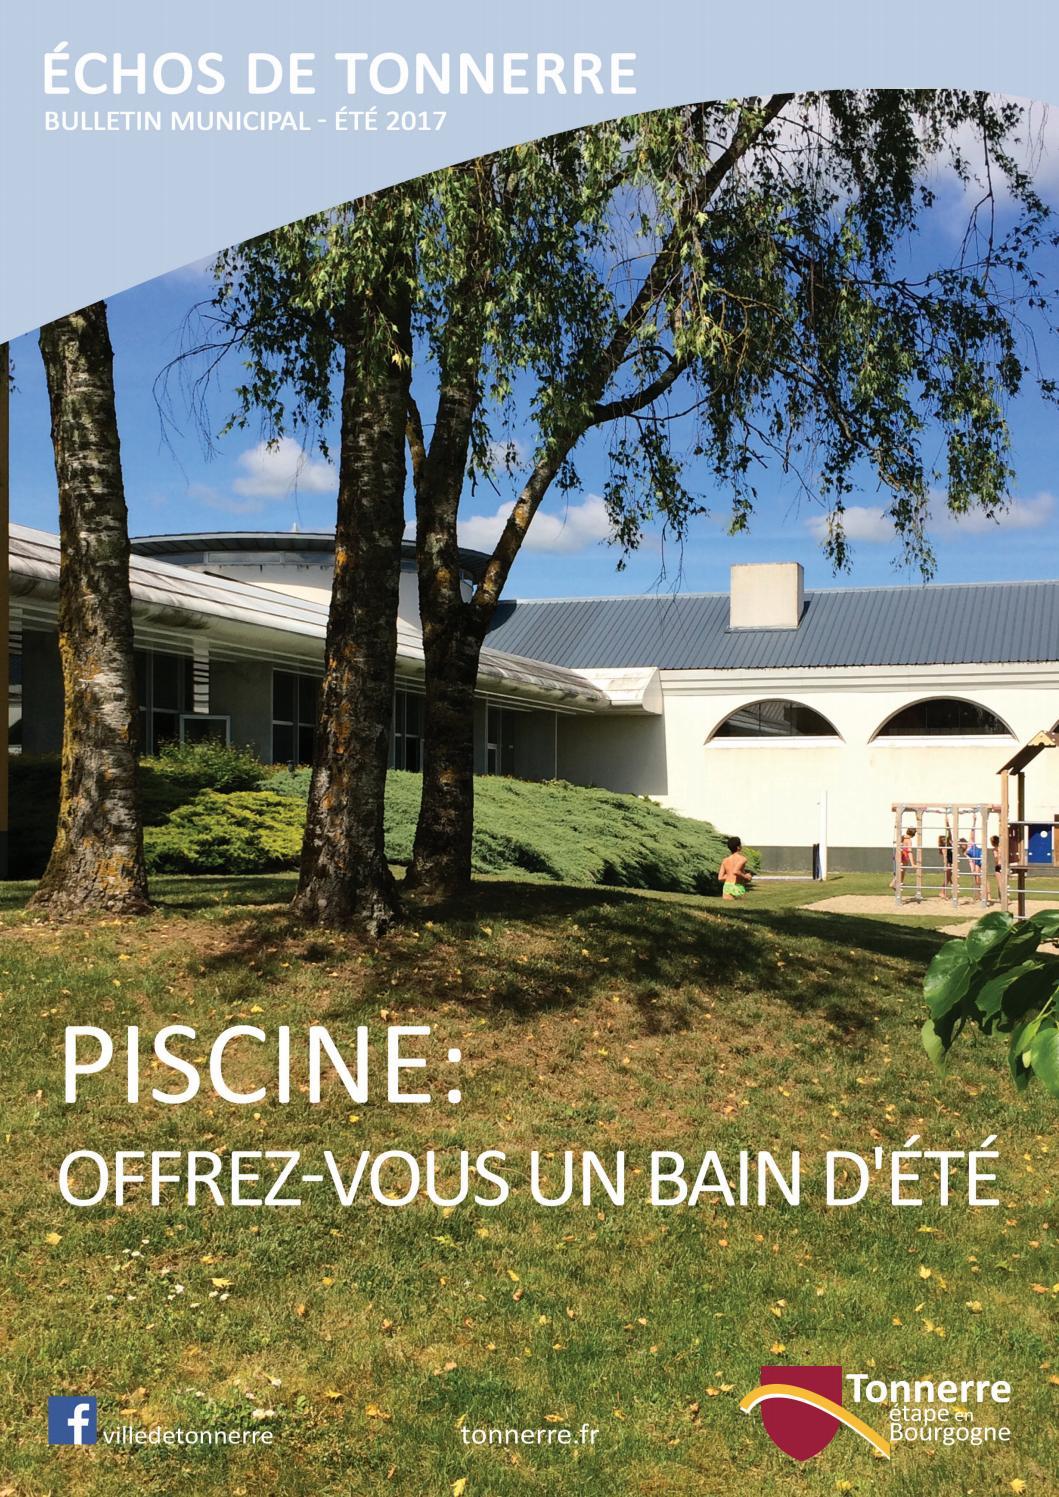 Bulletin De Tonnerre - Juin 2017 By Mairie De Tonnerre - Issuu à Piscine Avallon